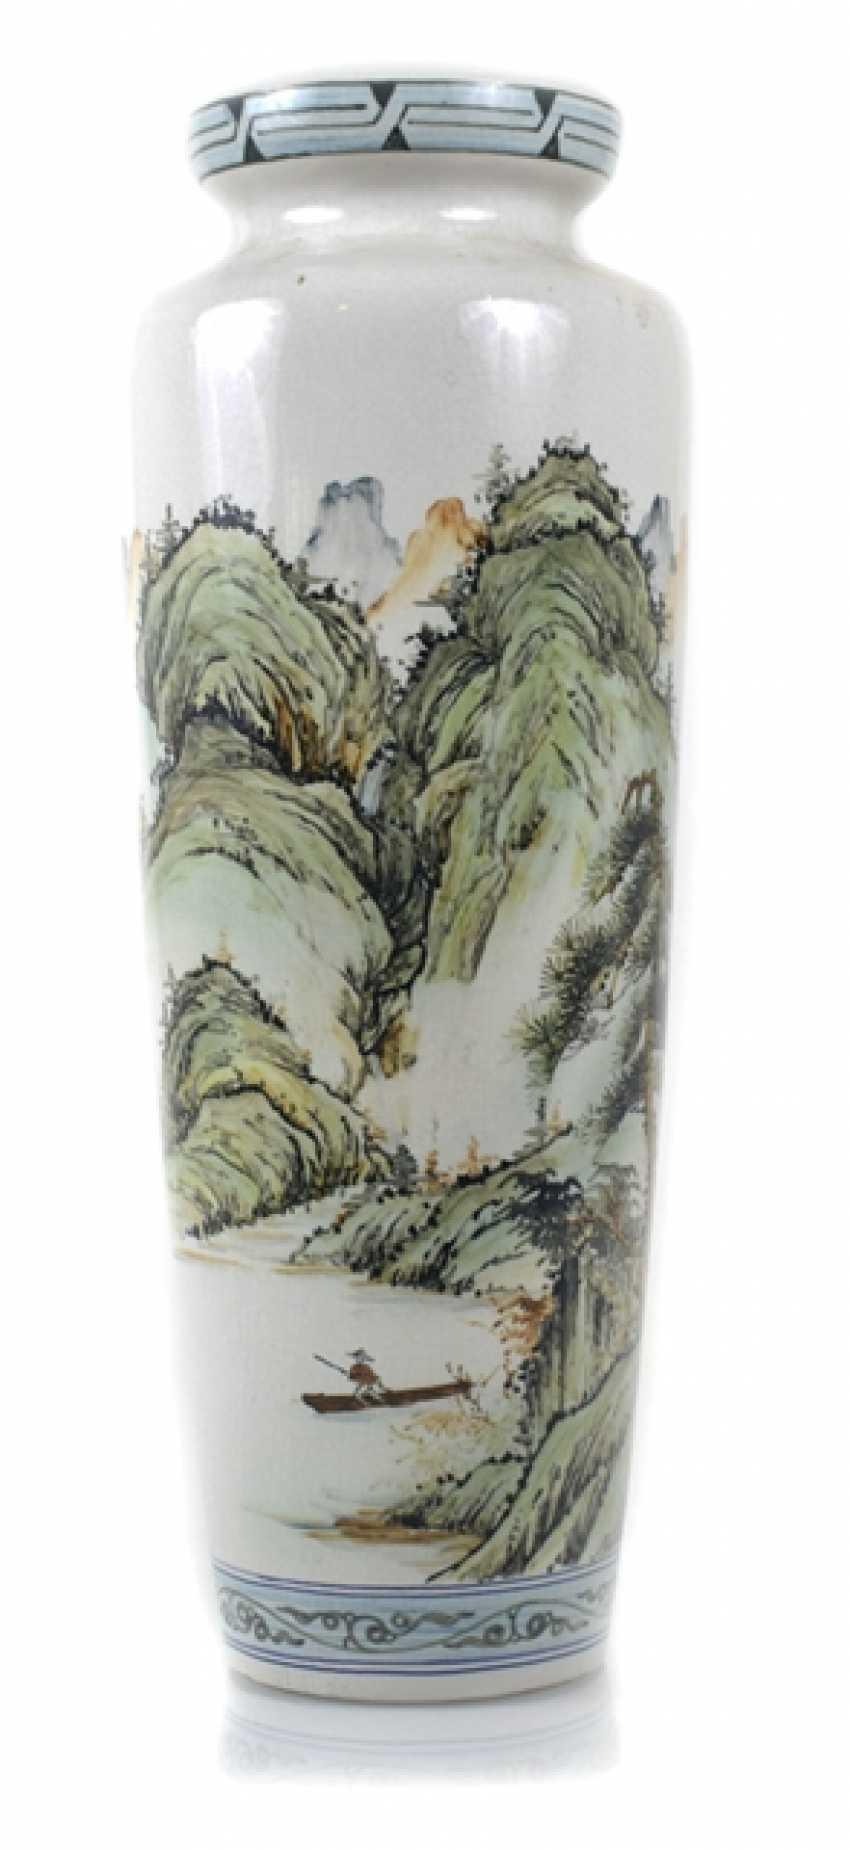 Floor vase made of porcelain with inscription and landscape decoration - photo 1